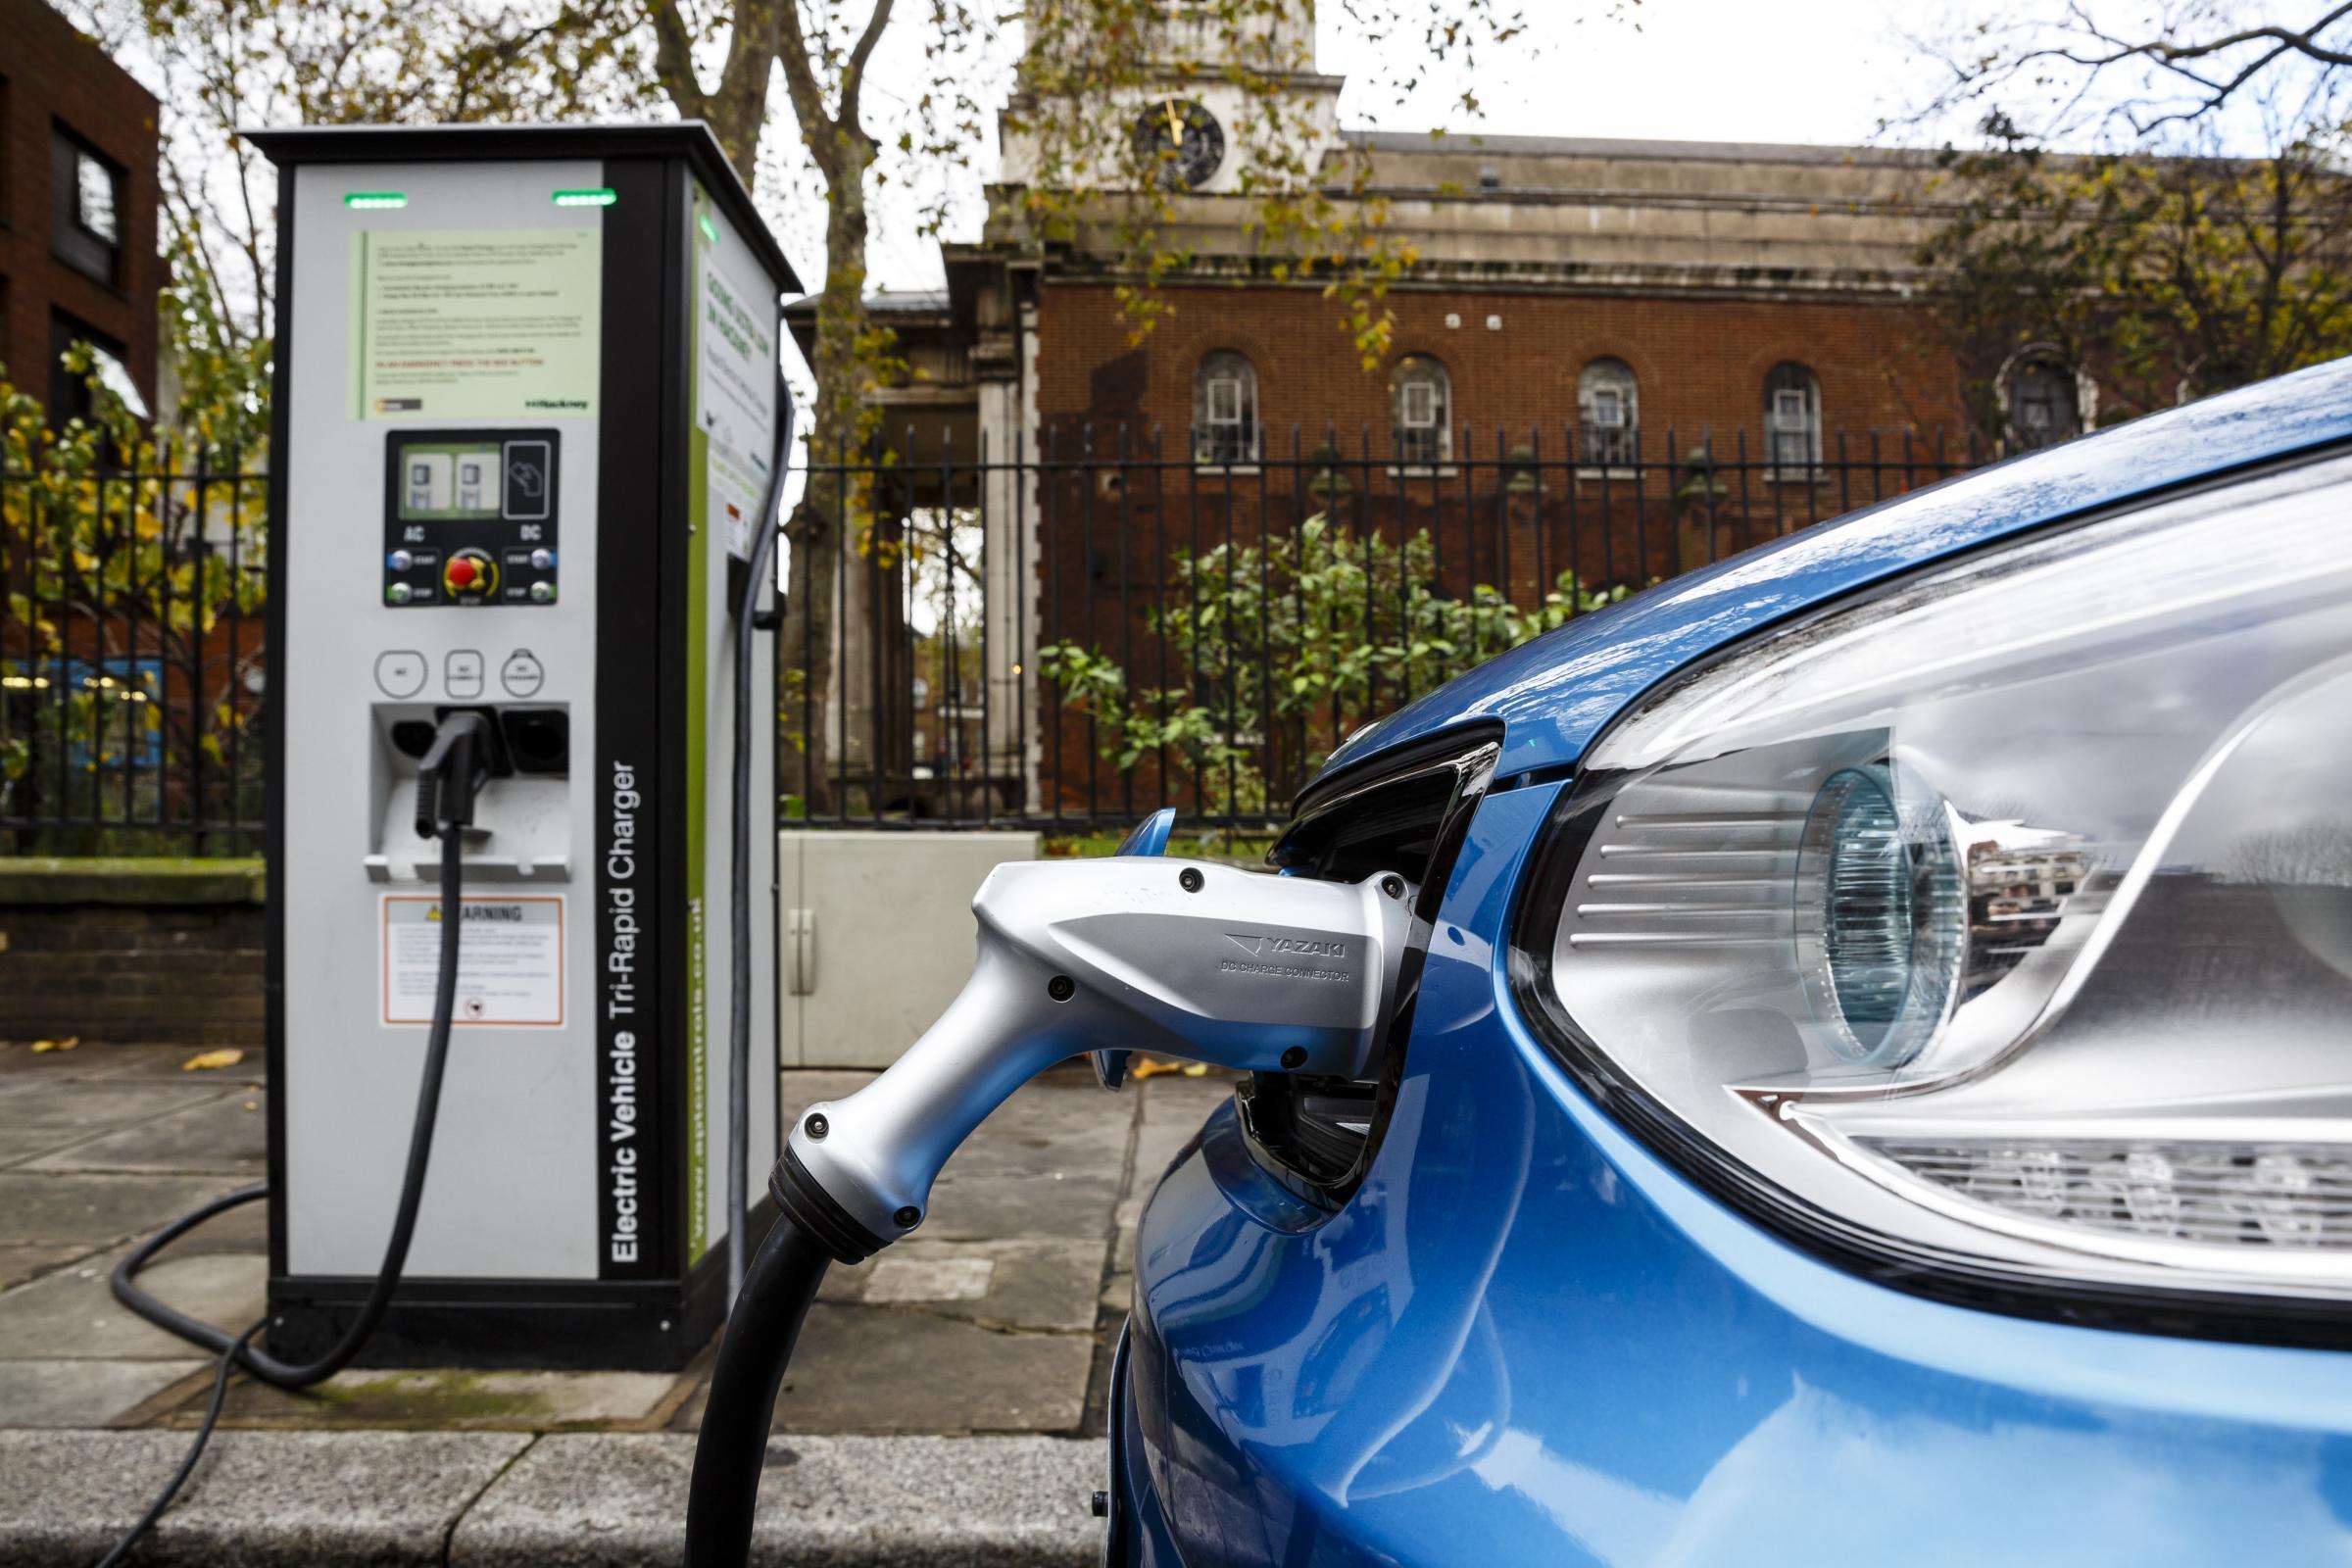 Scotland's 'new oil' should be green hydrogen